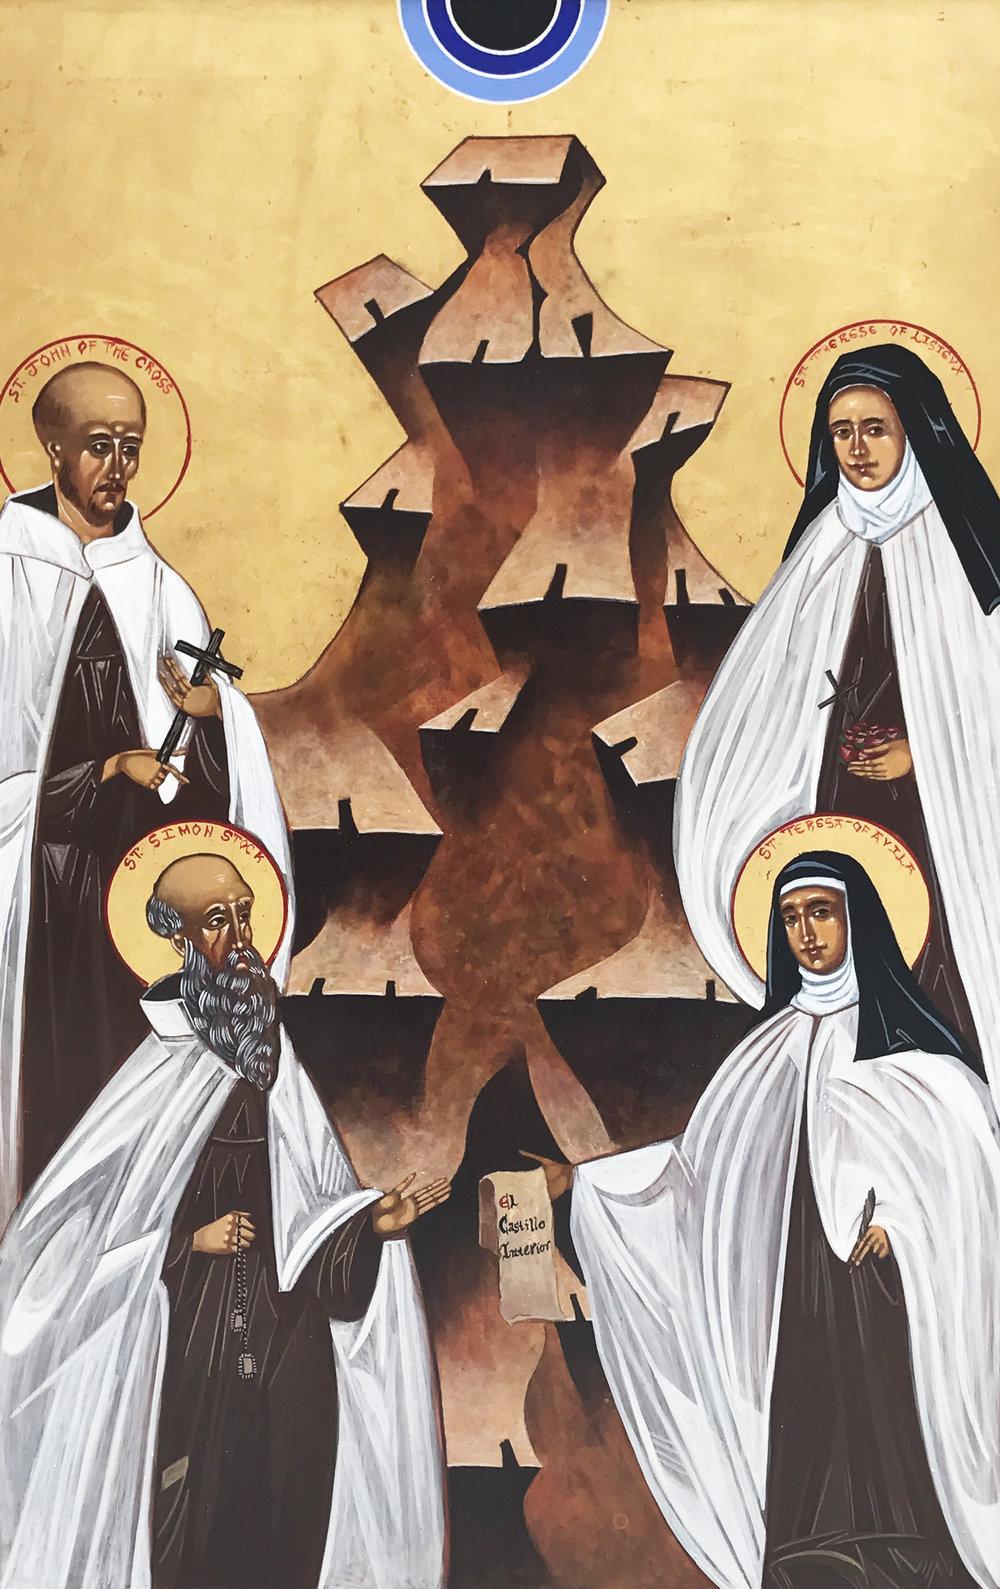 Saints of Mt. Carmel